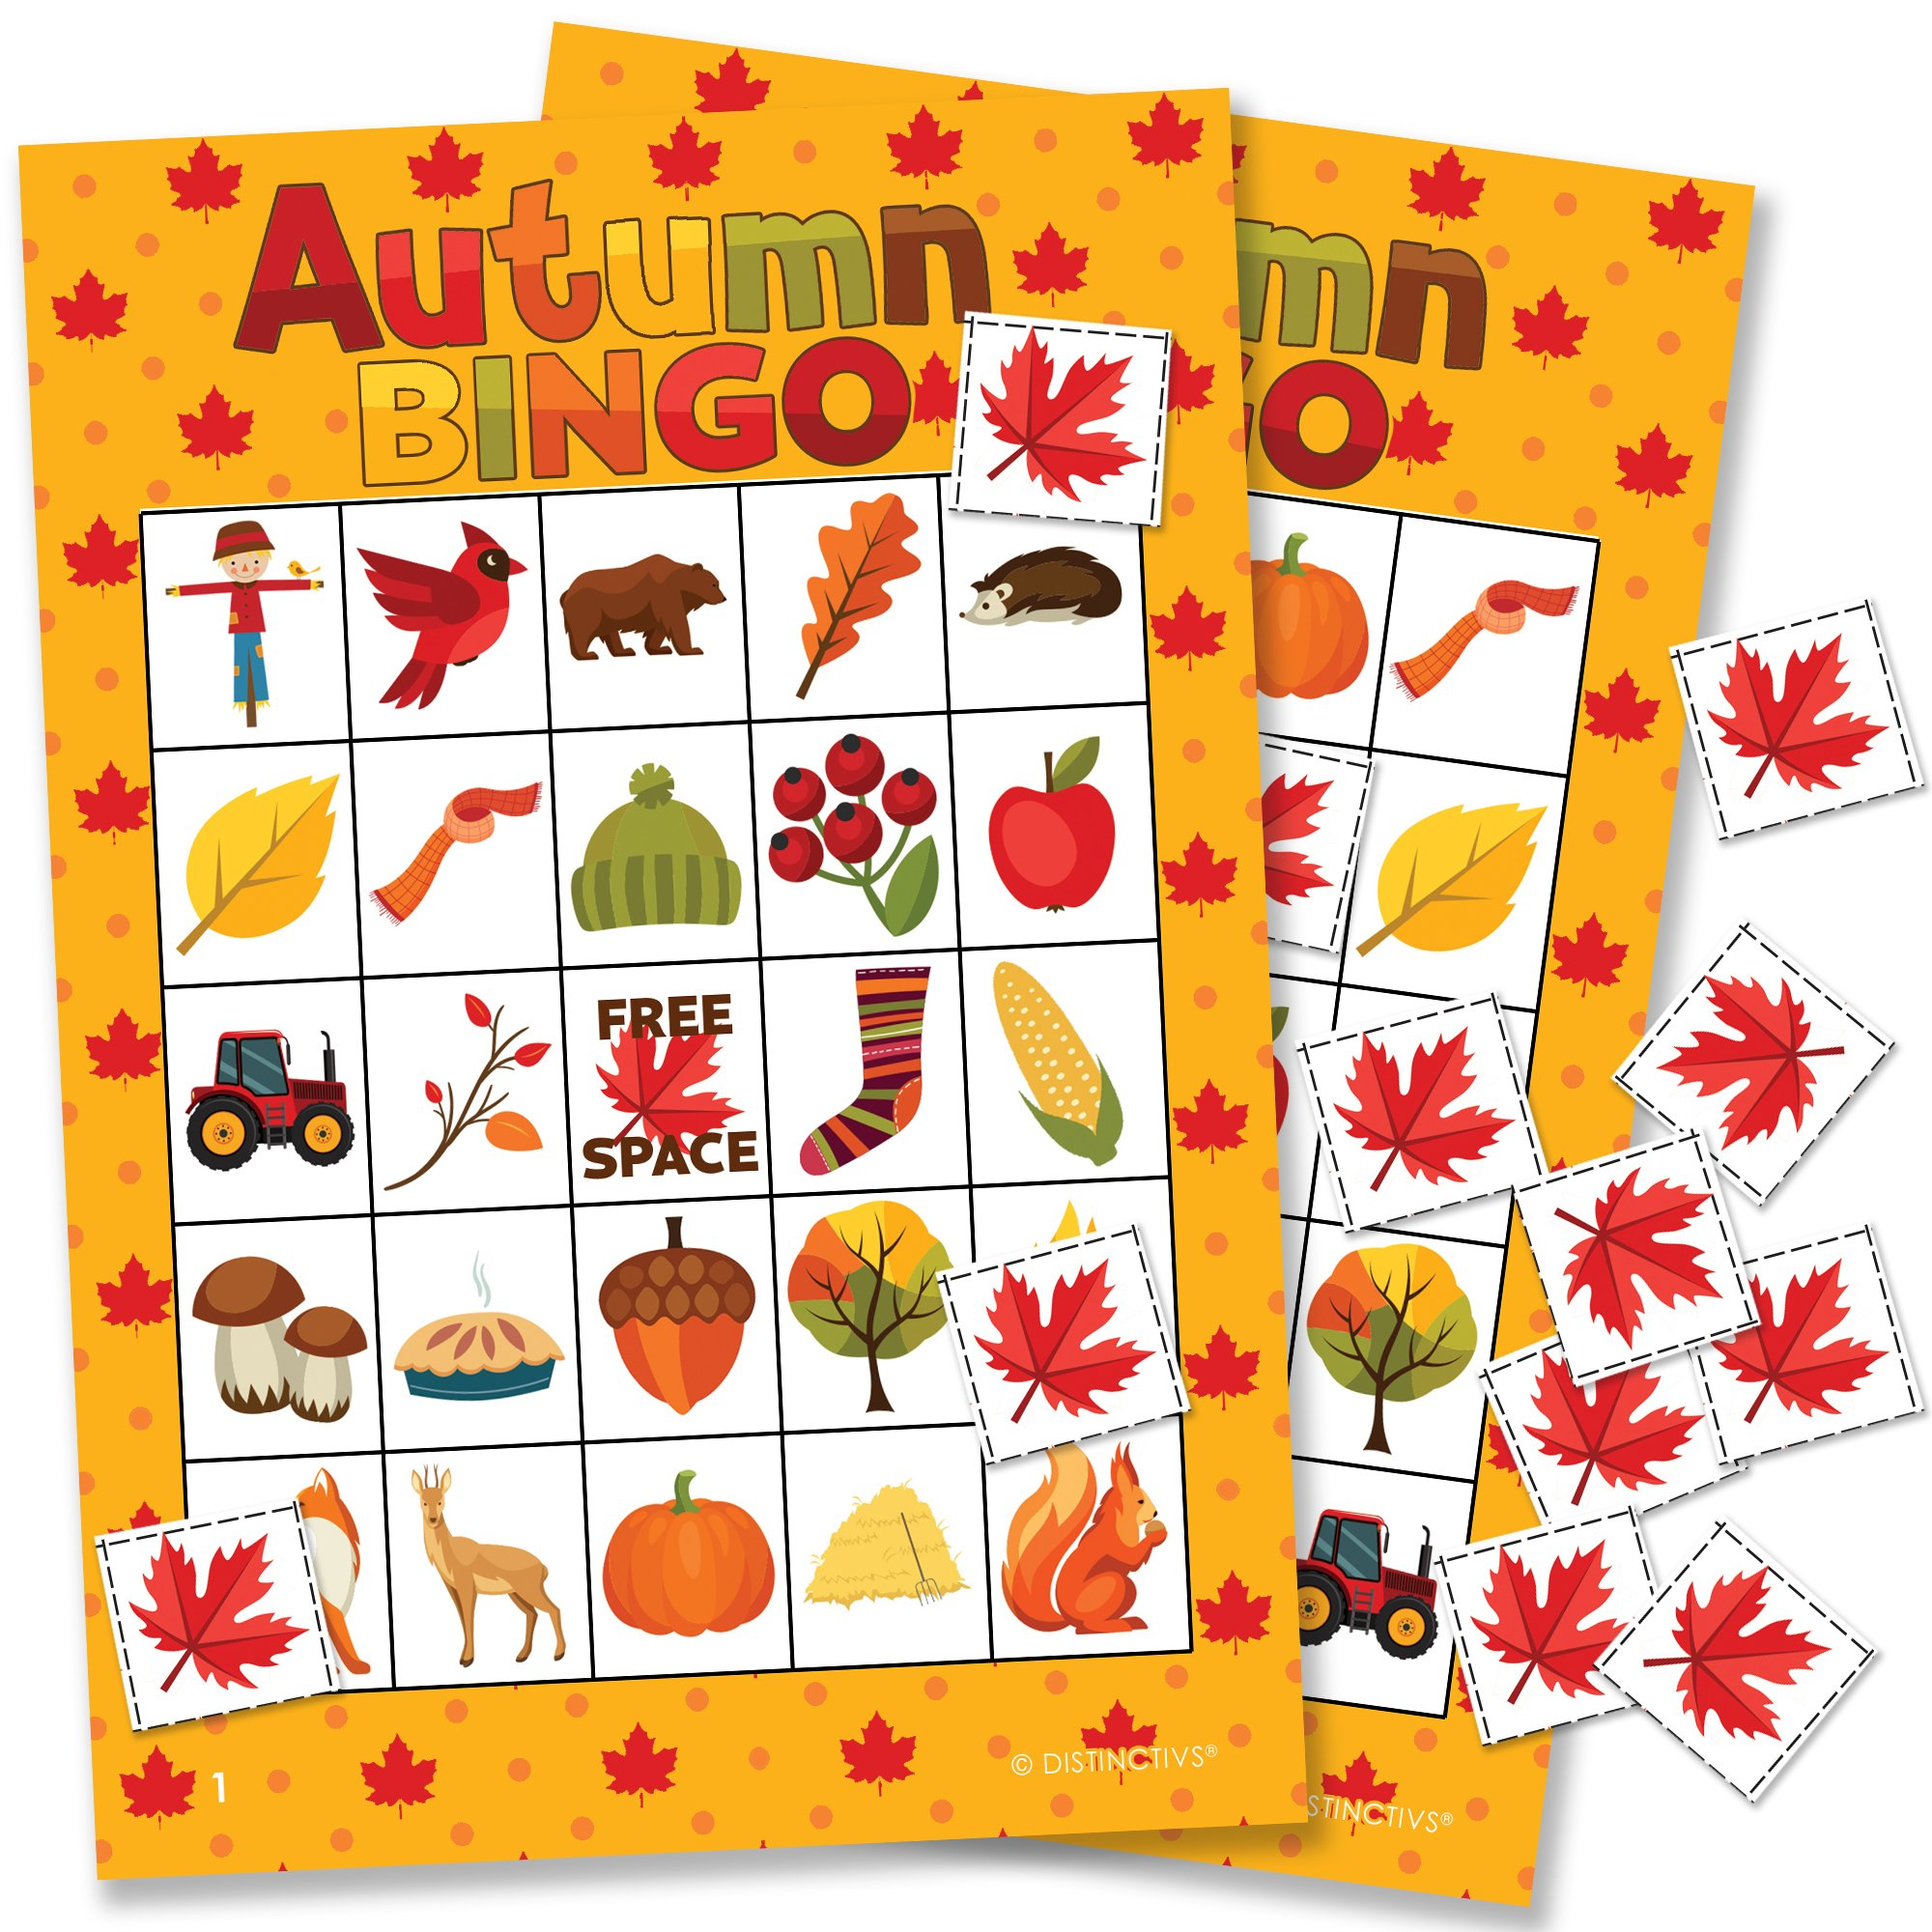 Autumn Fall Festival Bingo Game - 24 Players by DISTINCTIVS